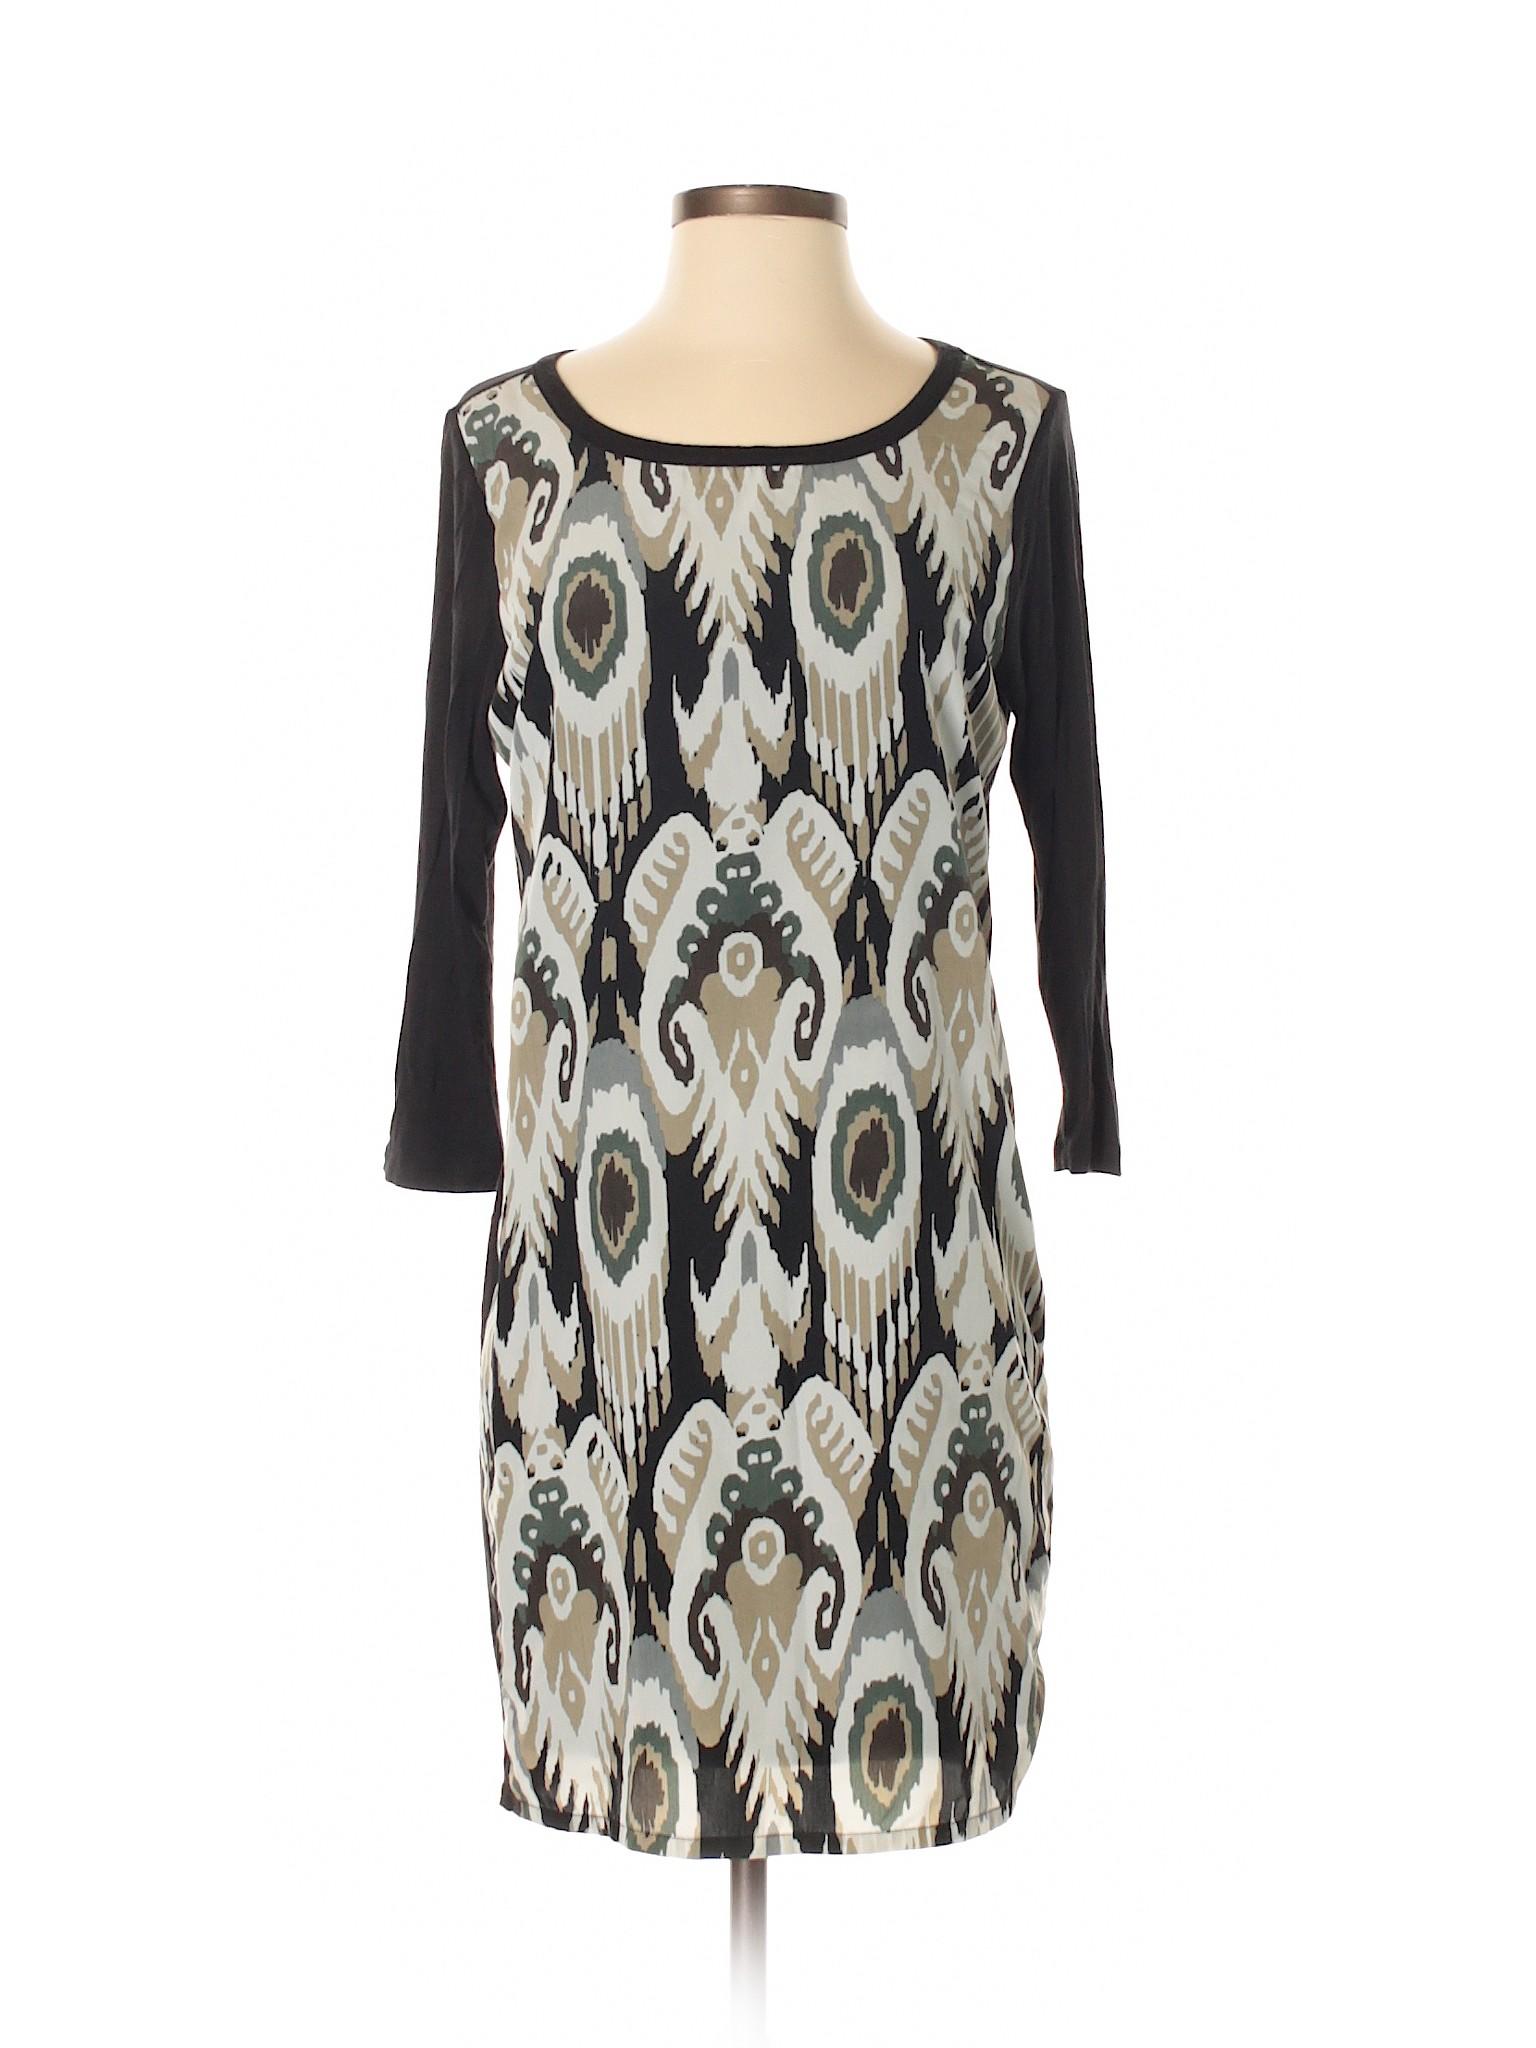 Boutique Casual Dress Cha Winter Vente qrw4qg1